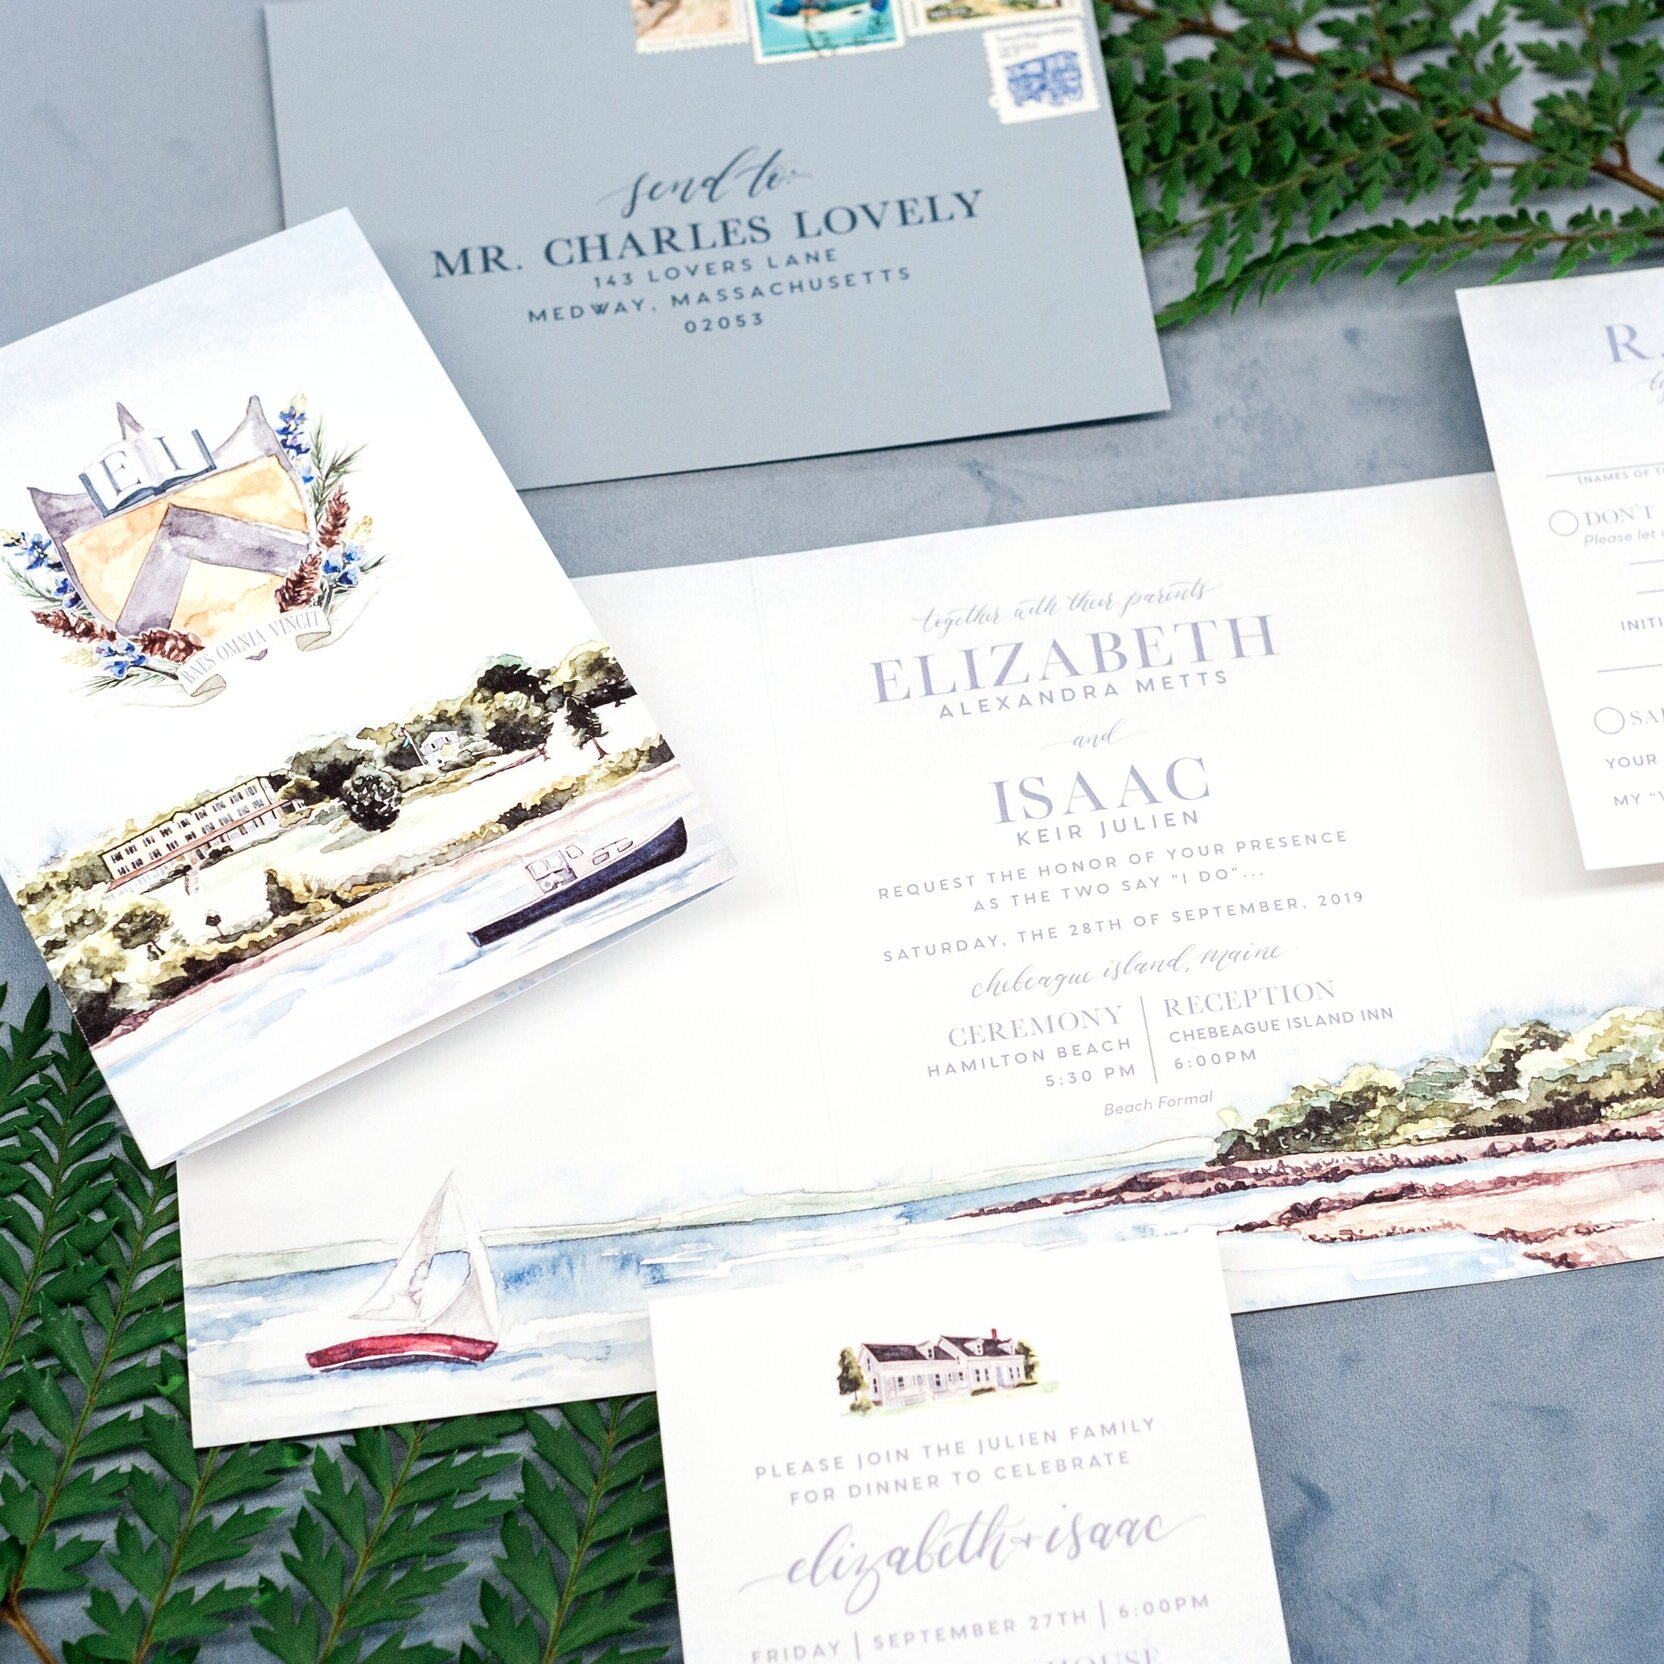 CHEBEAGUE ISLAND INN WATERCOLOR WEDDING INVITATIONS